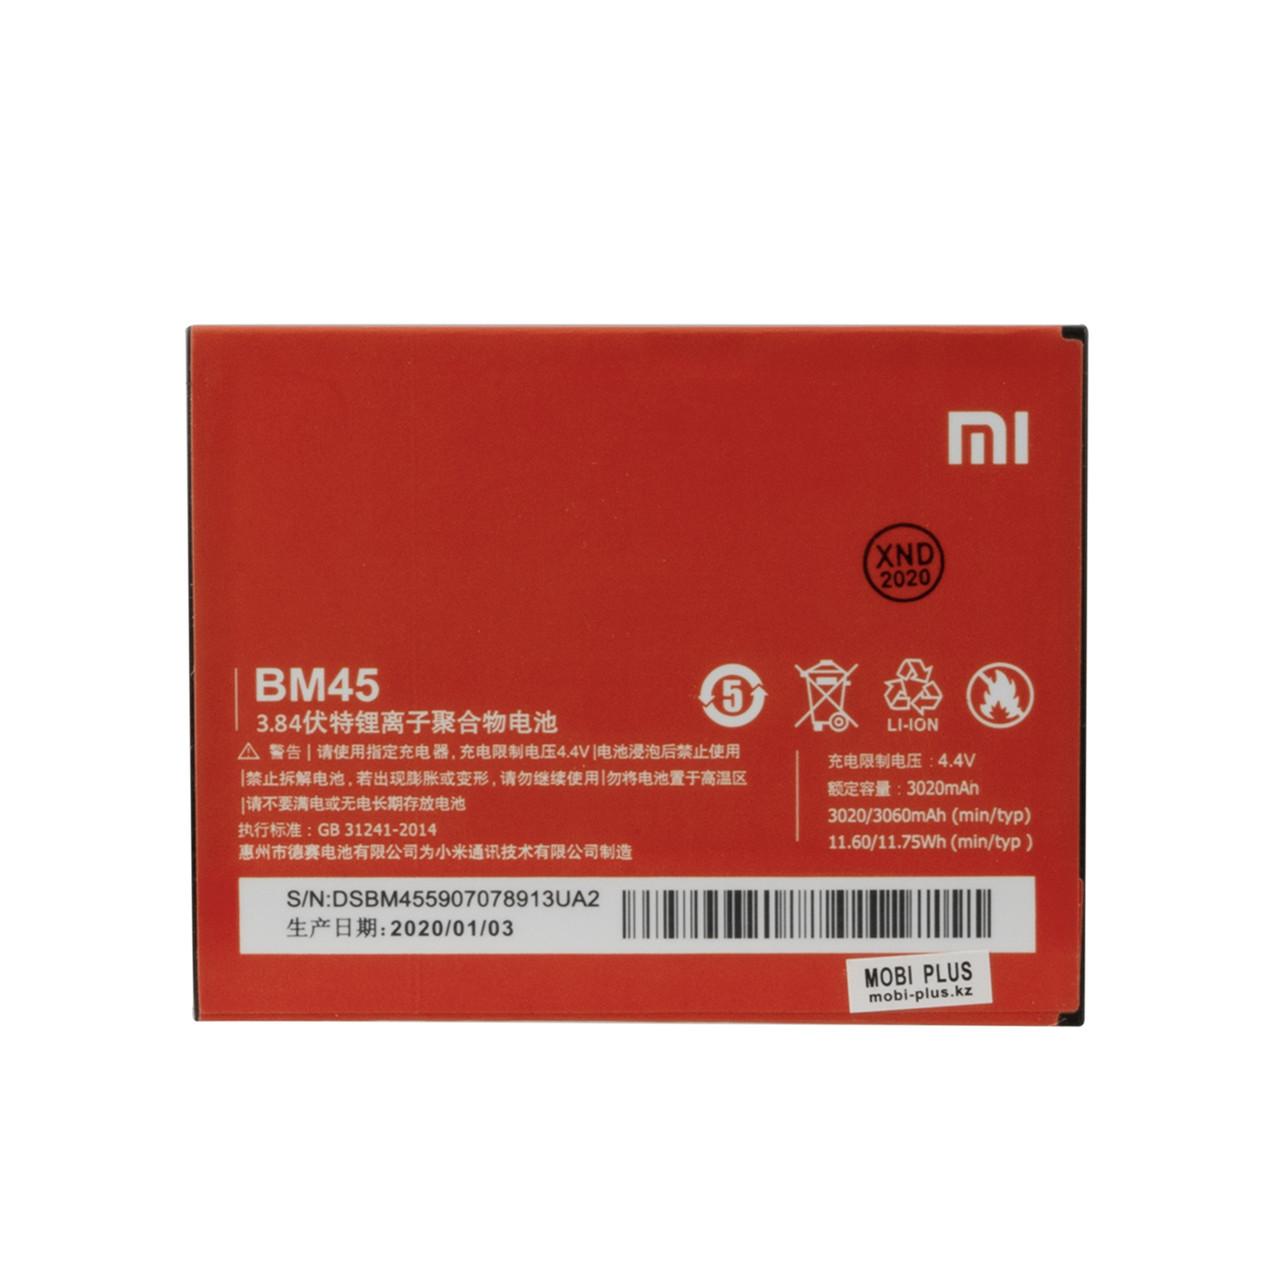 Аккумулятор Xiaomi BM45 Redmi Note 2 3020mAh GU Electronic